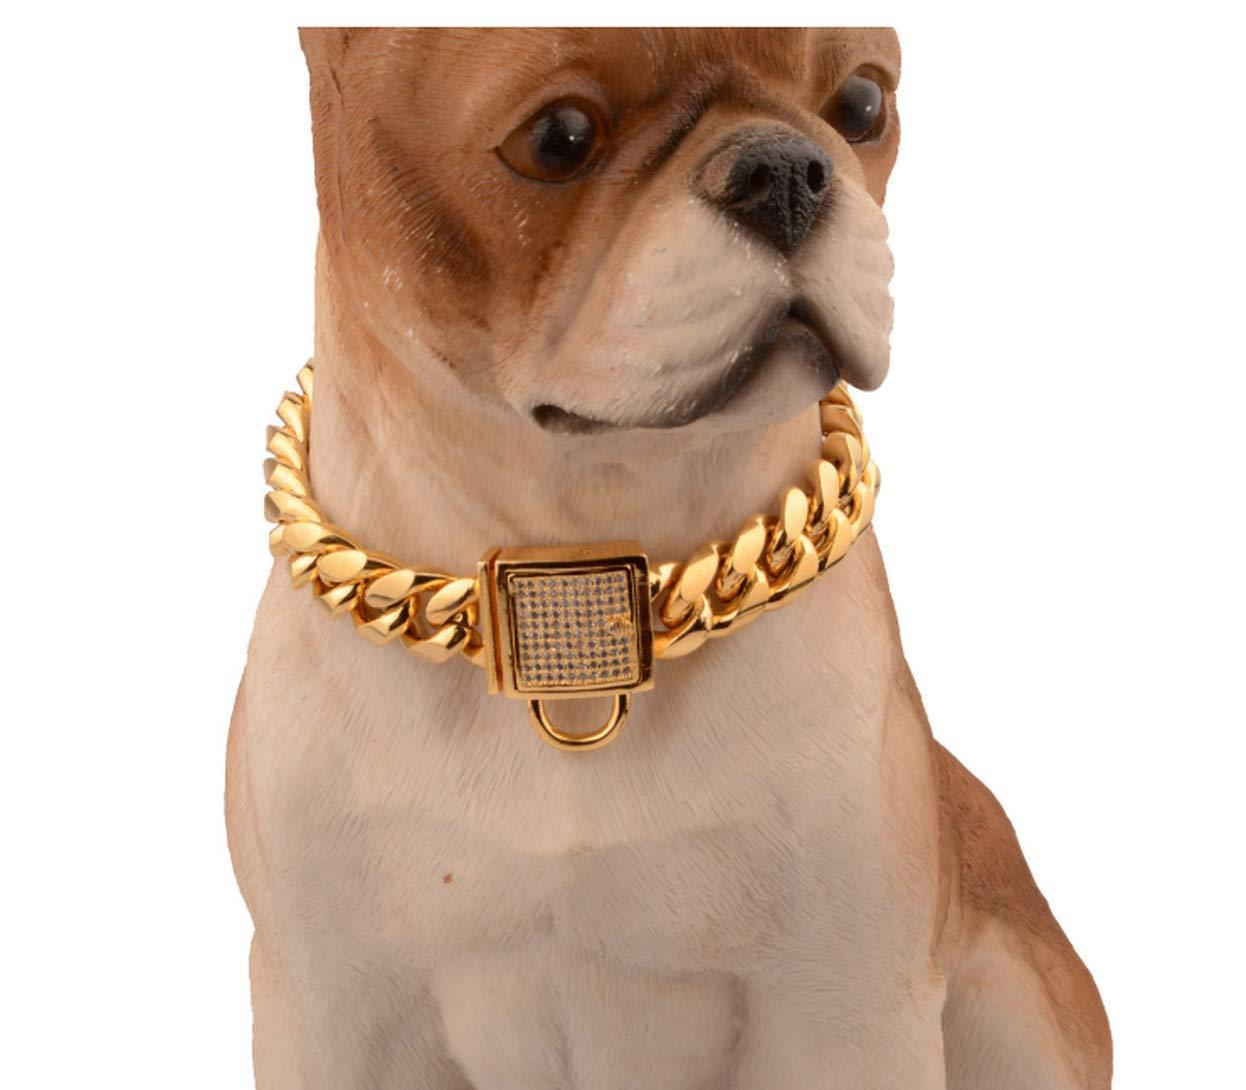 gold 18inch gold 18inch MICHEALWU Stainless Steel Training Chain Pitbull Pet Dog Choke Collar Metal Dog Collar Stainless Steel 14mm gold